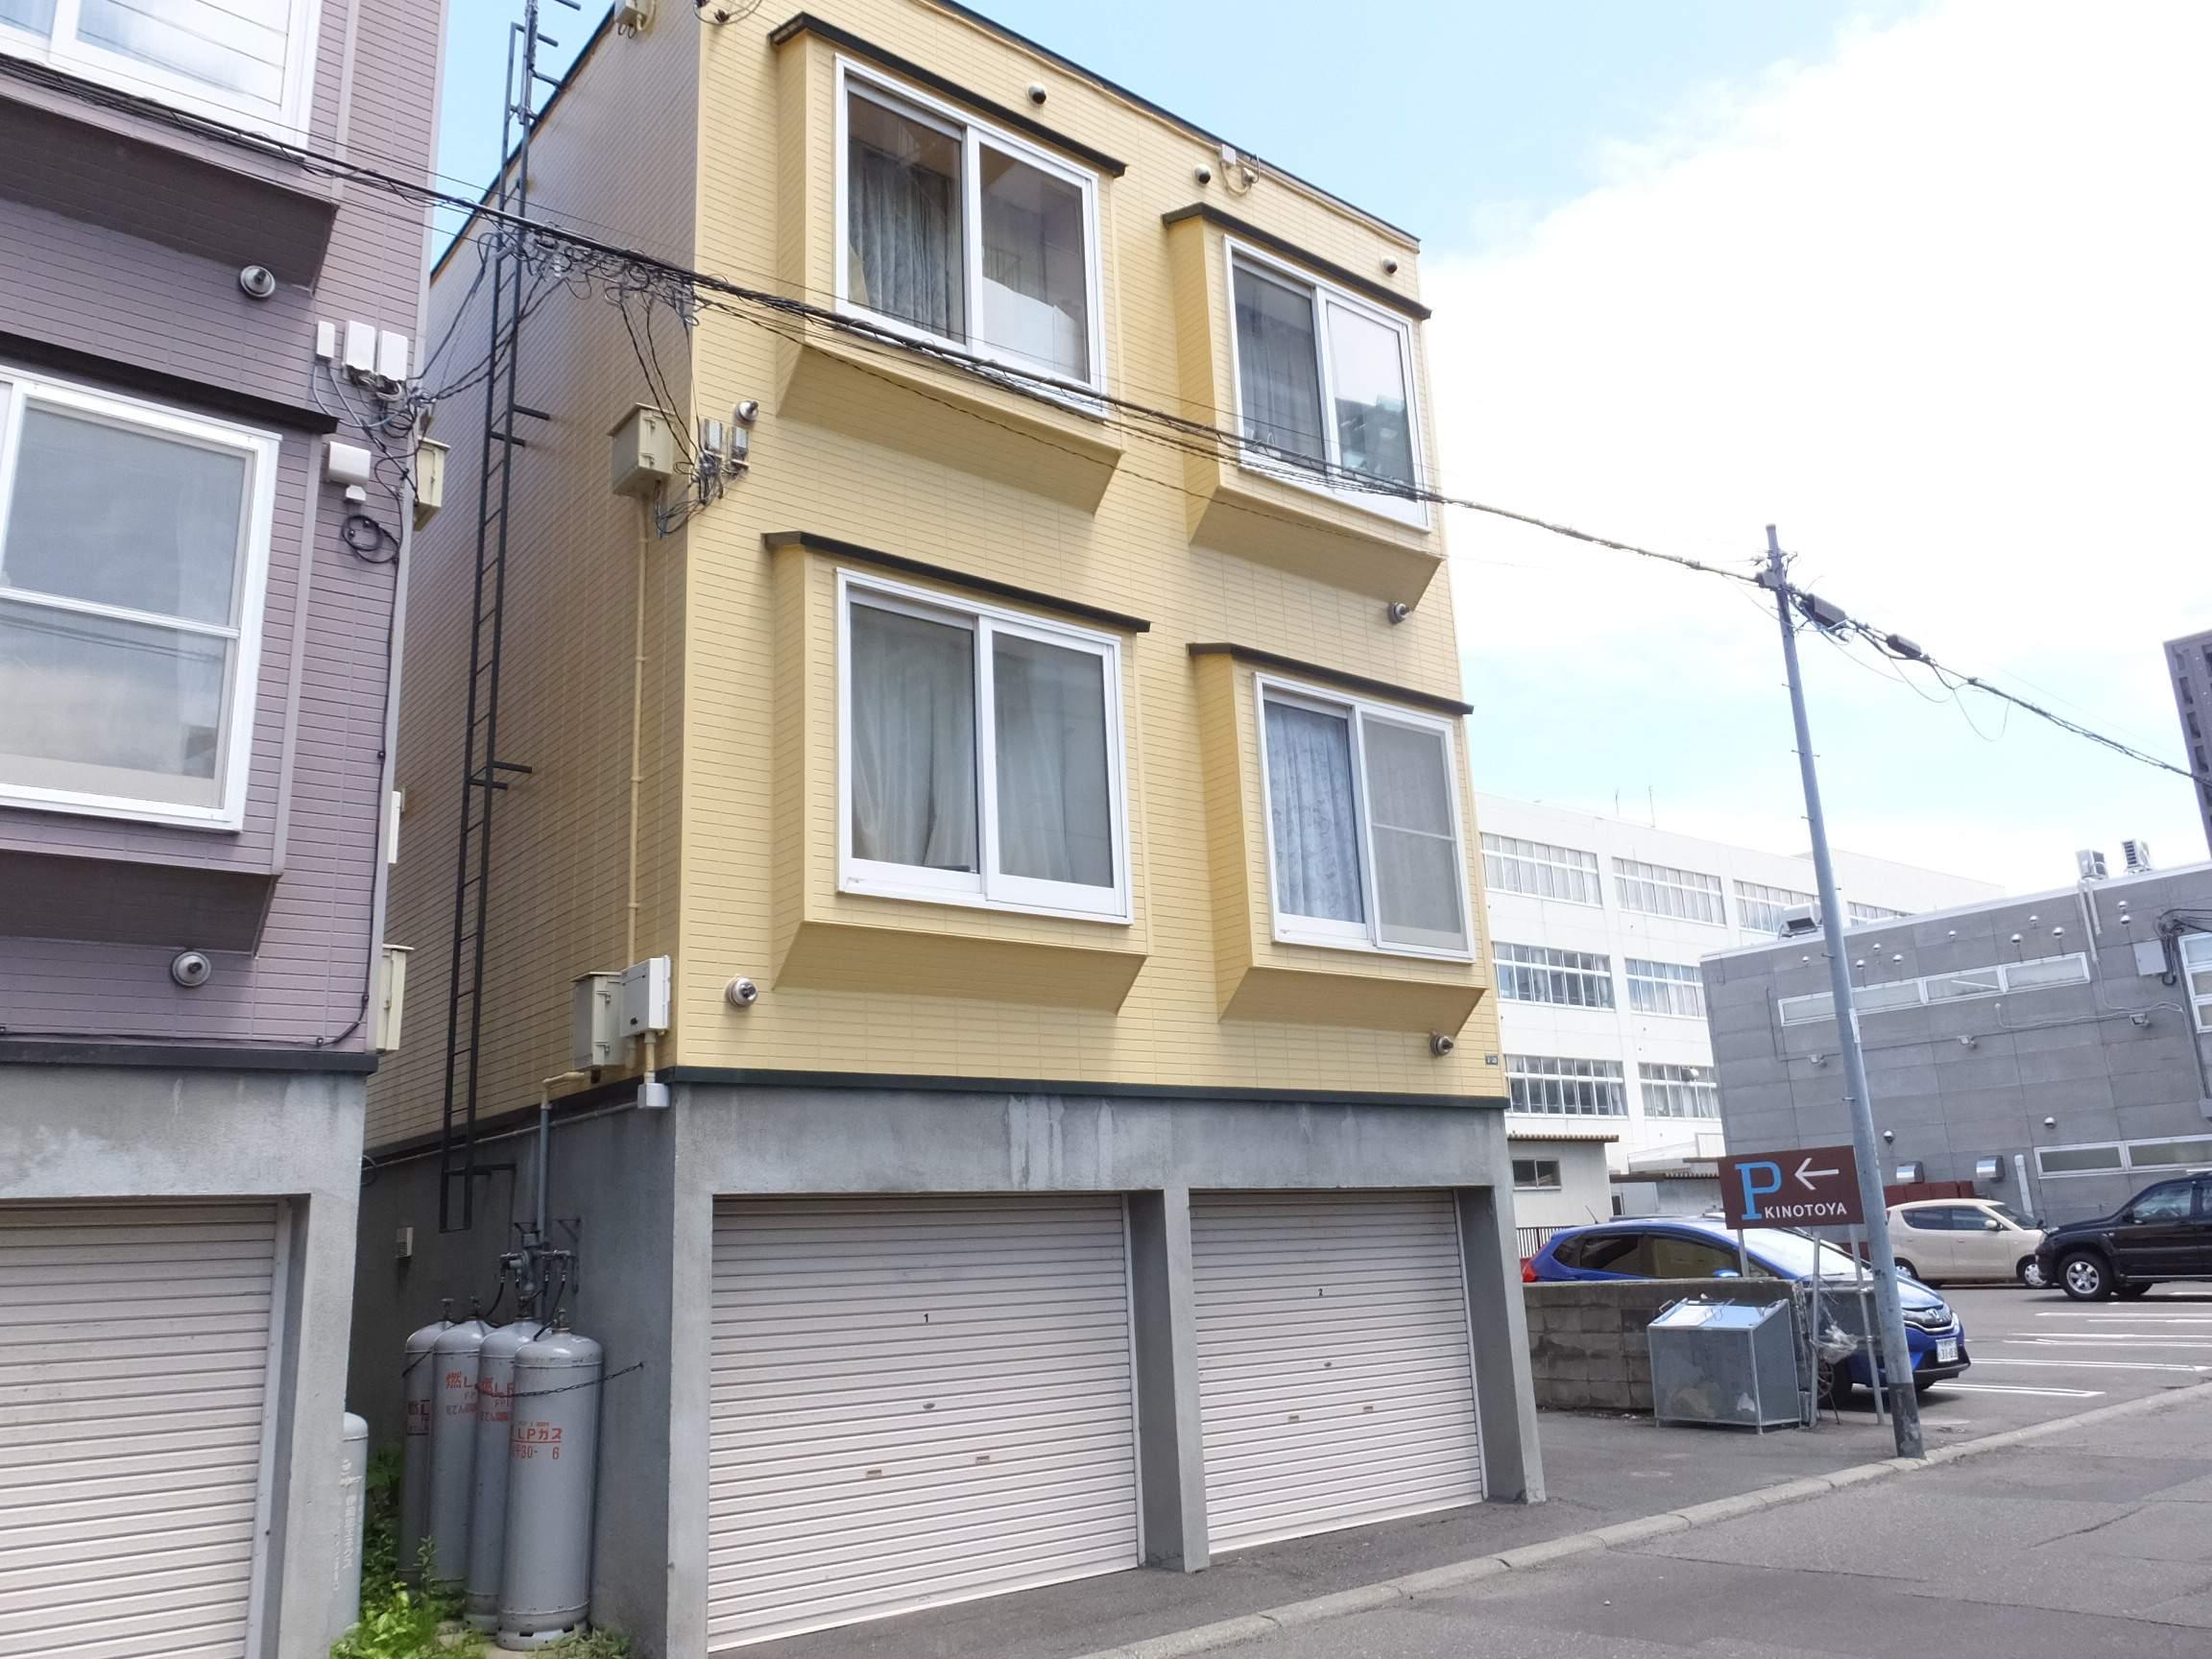 北海道札幌市白石区、東札幌駅徒歩10分の築22年 3階建の賃貸アパート